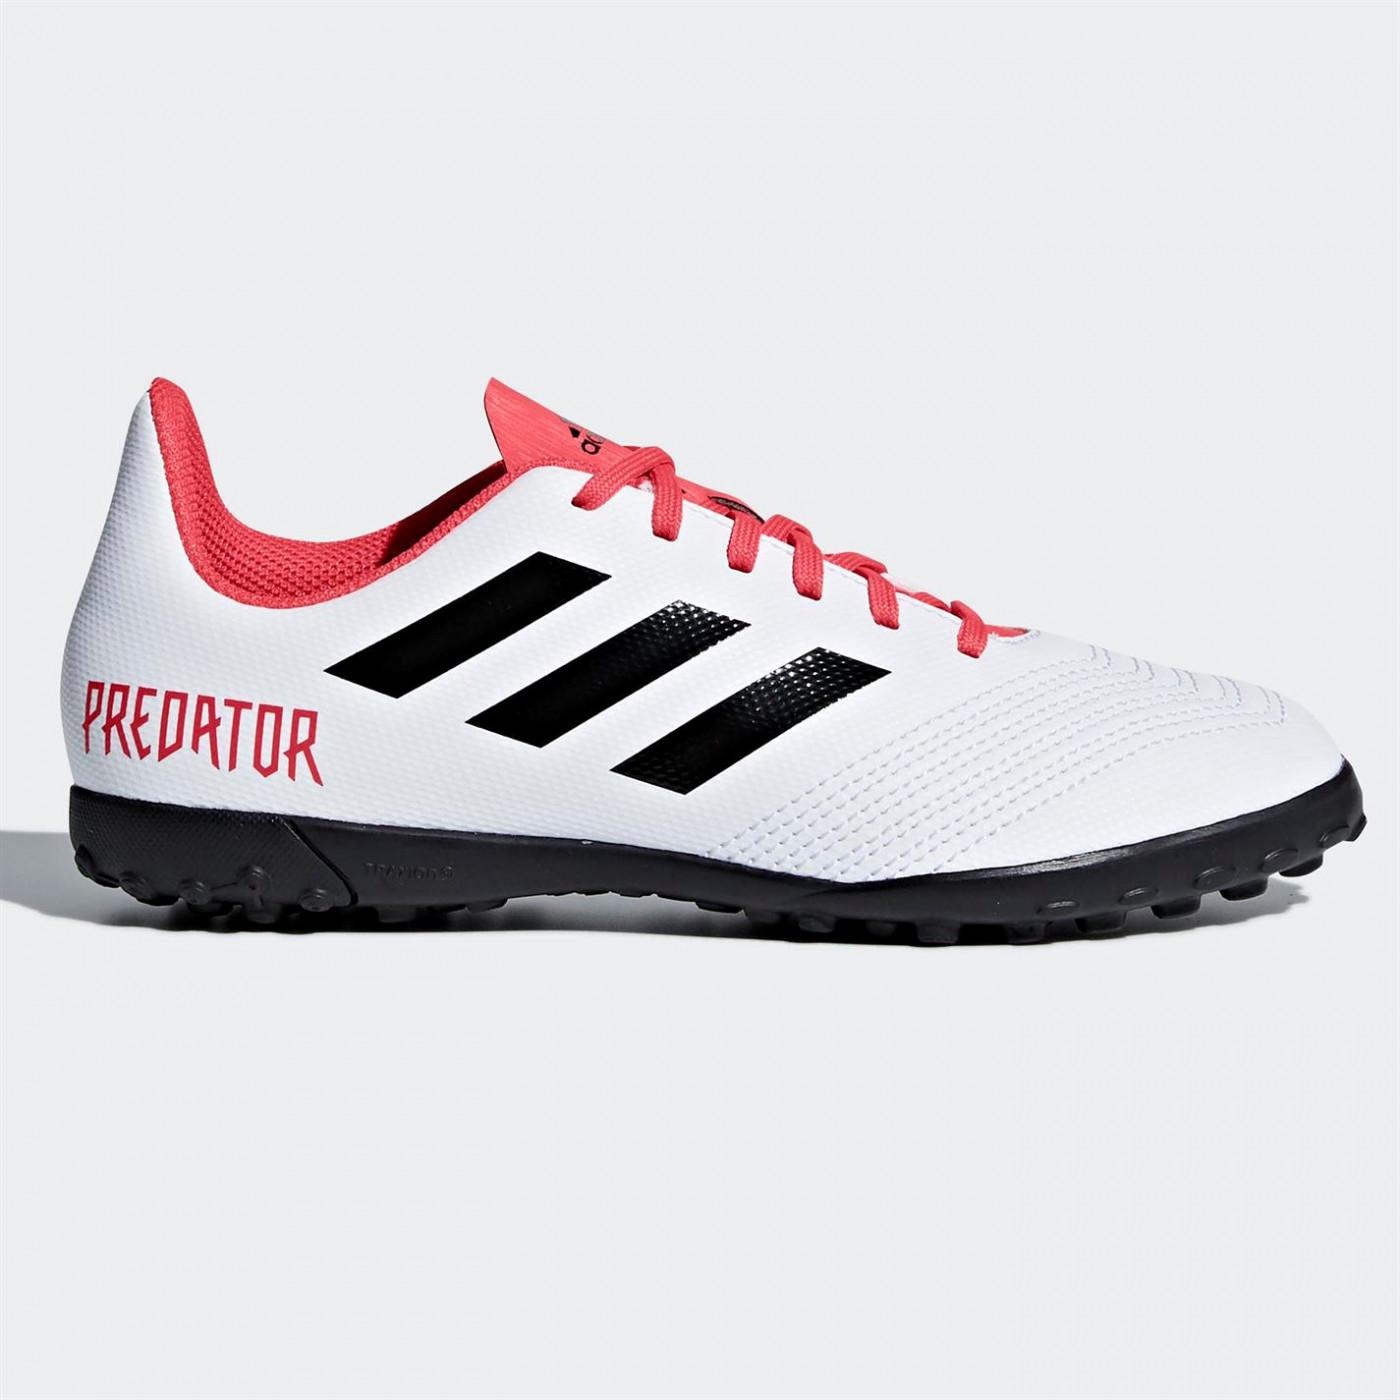 62853d98a7 Adidas Predator Tango 18.4 Junior Astro Turf Trainers - FACTCOOL